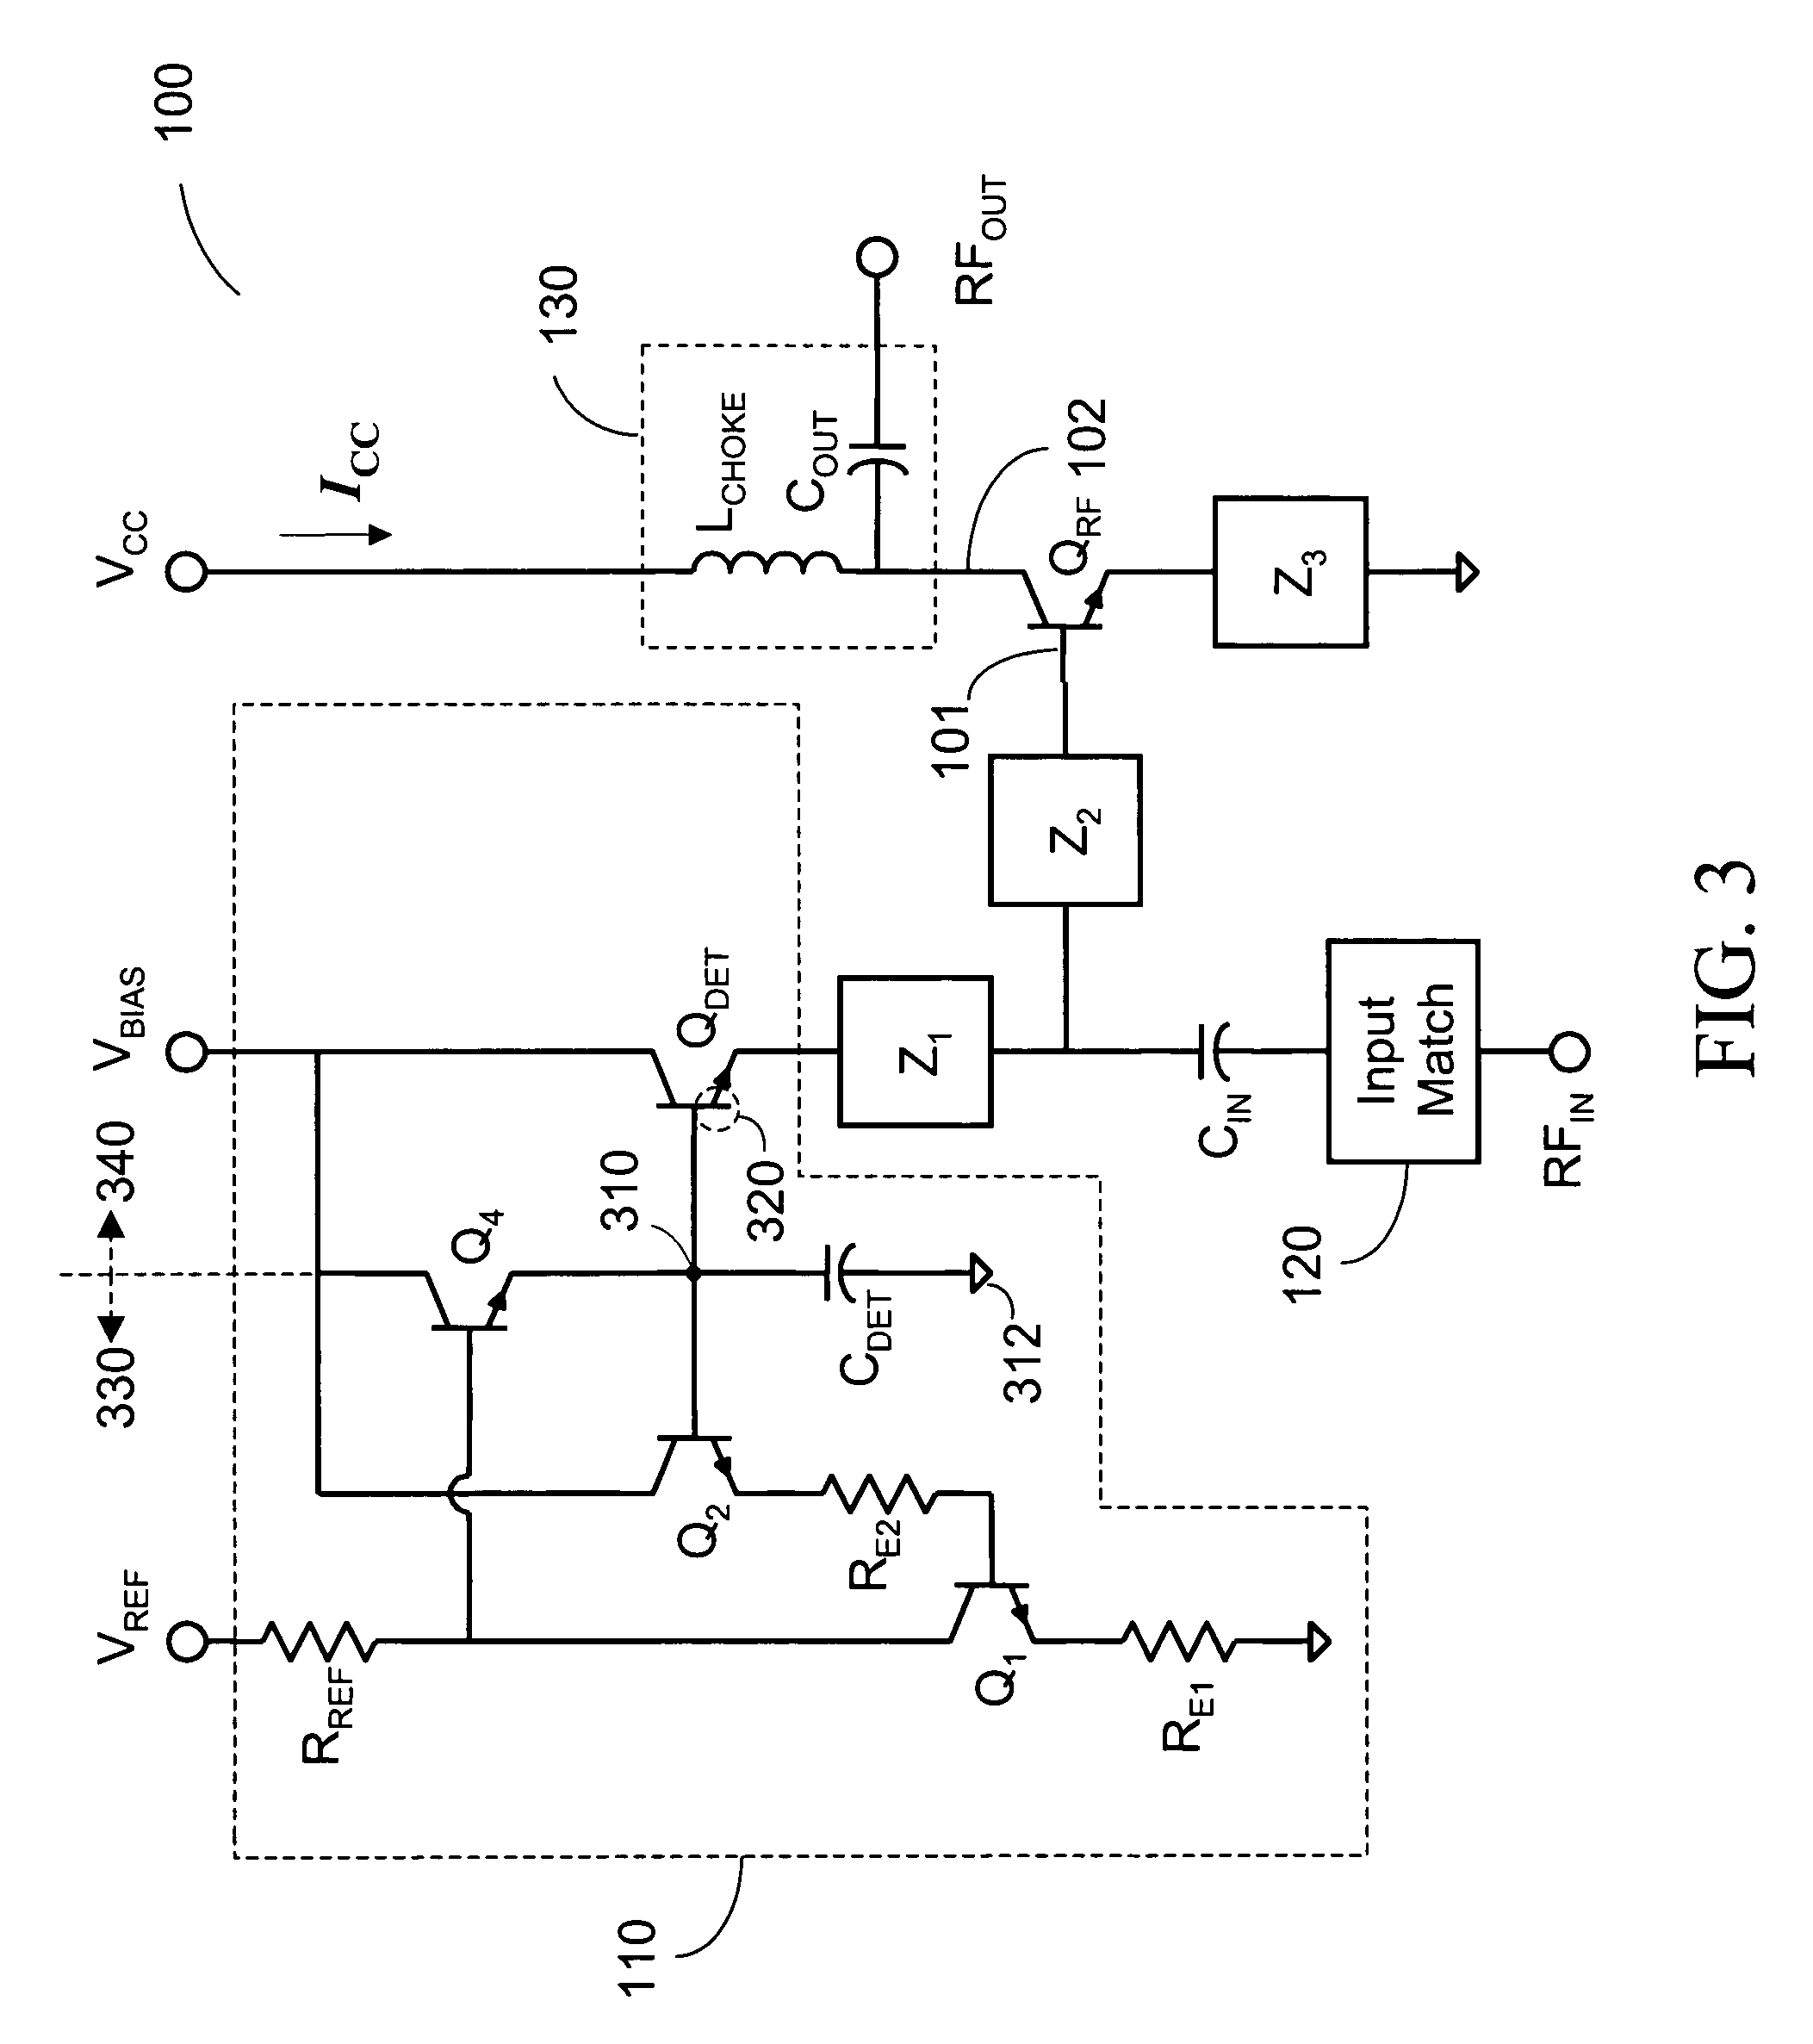 patent us7345547 - bias circuit for bjt amplifier